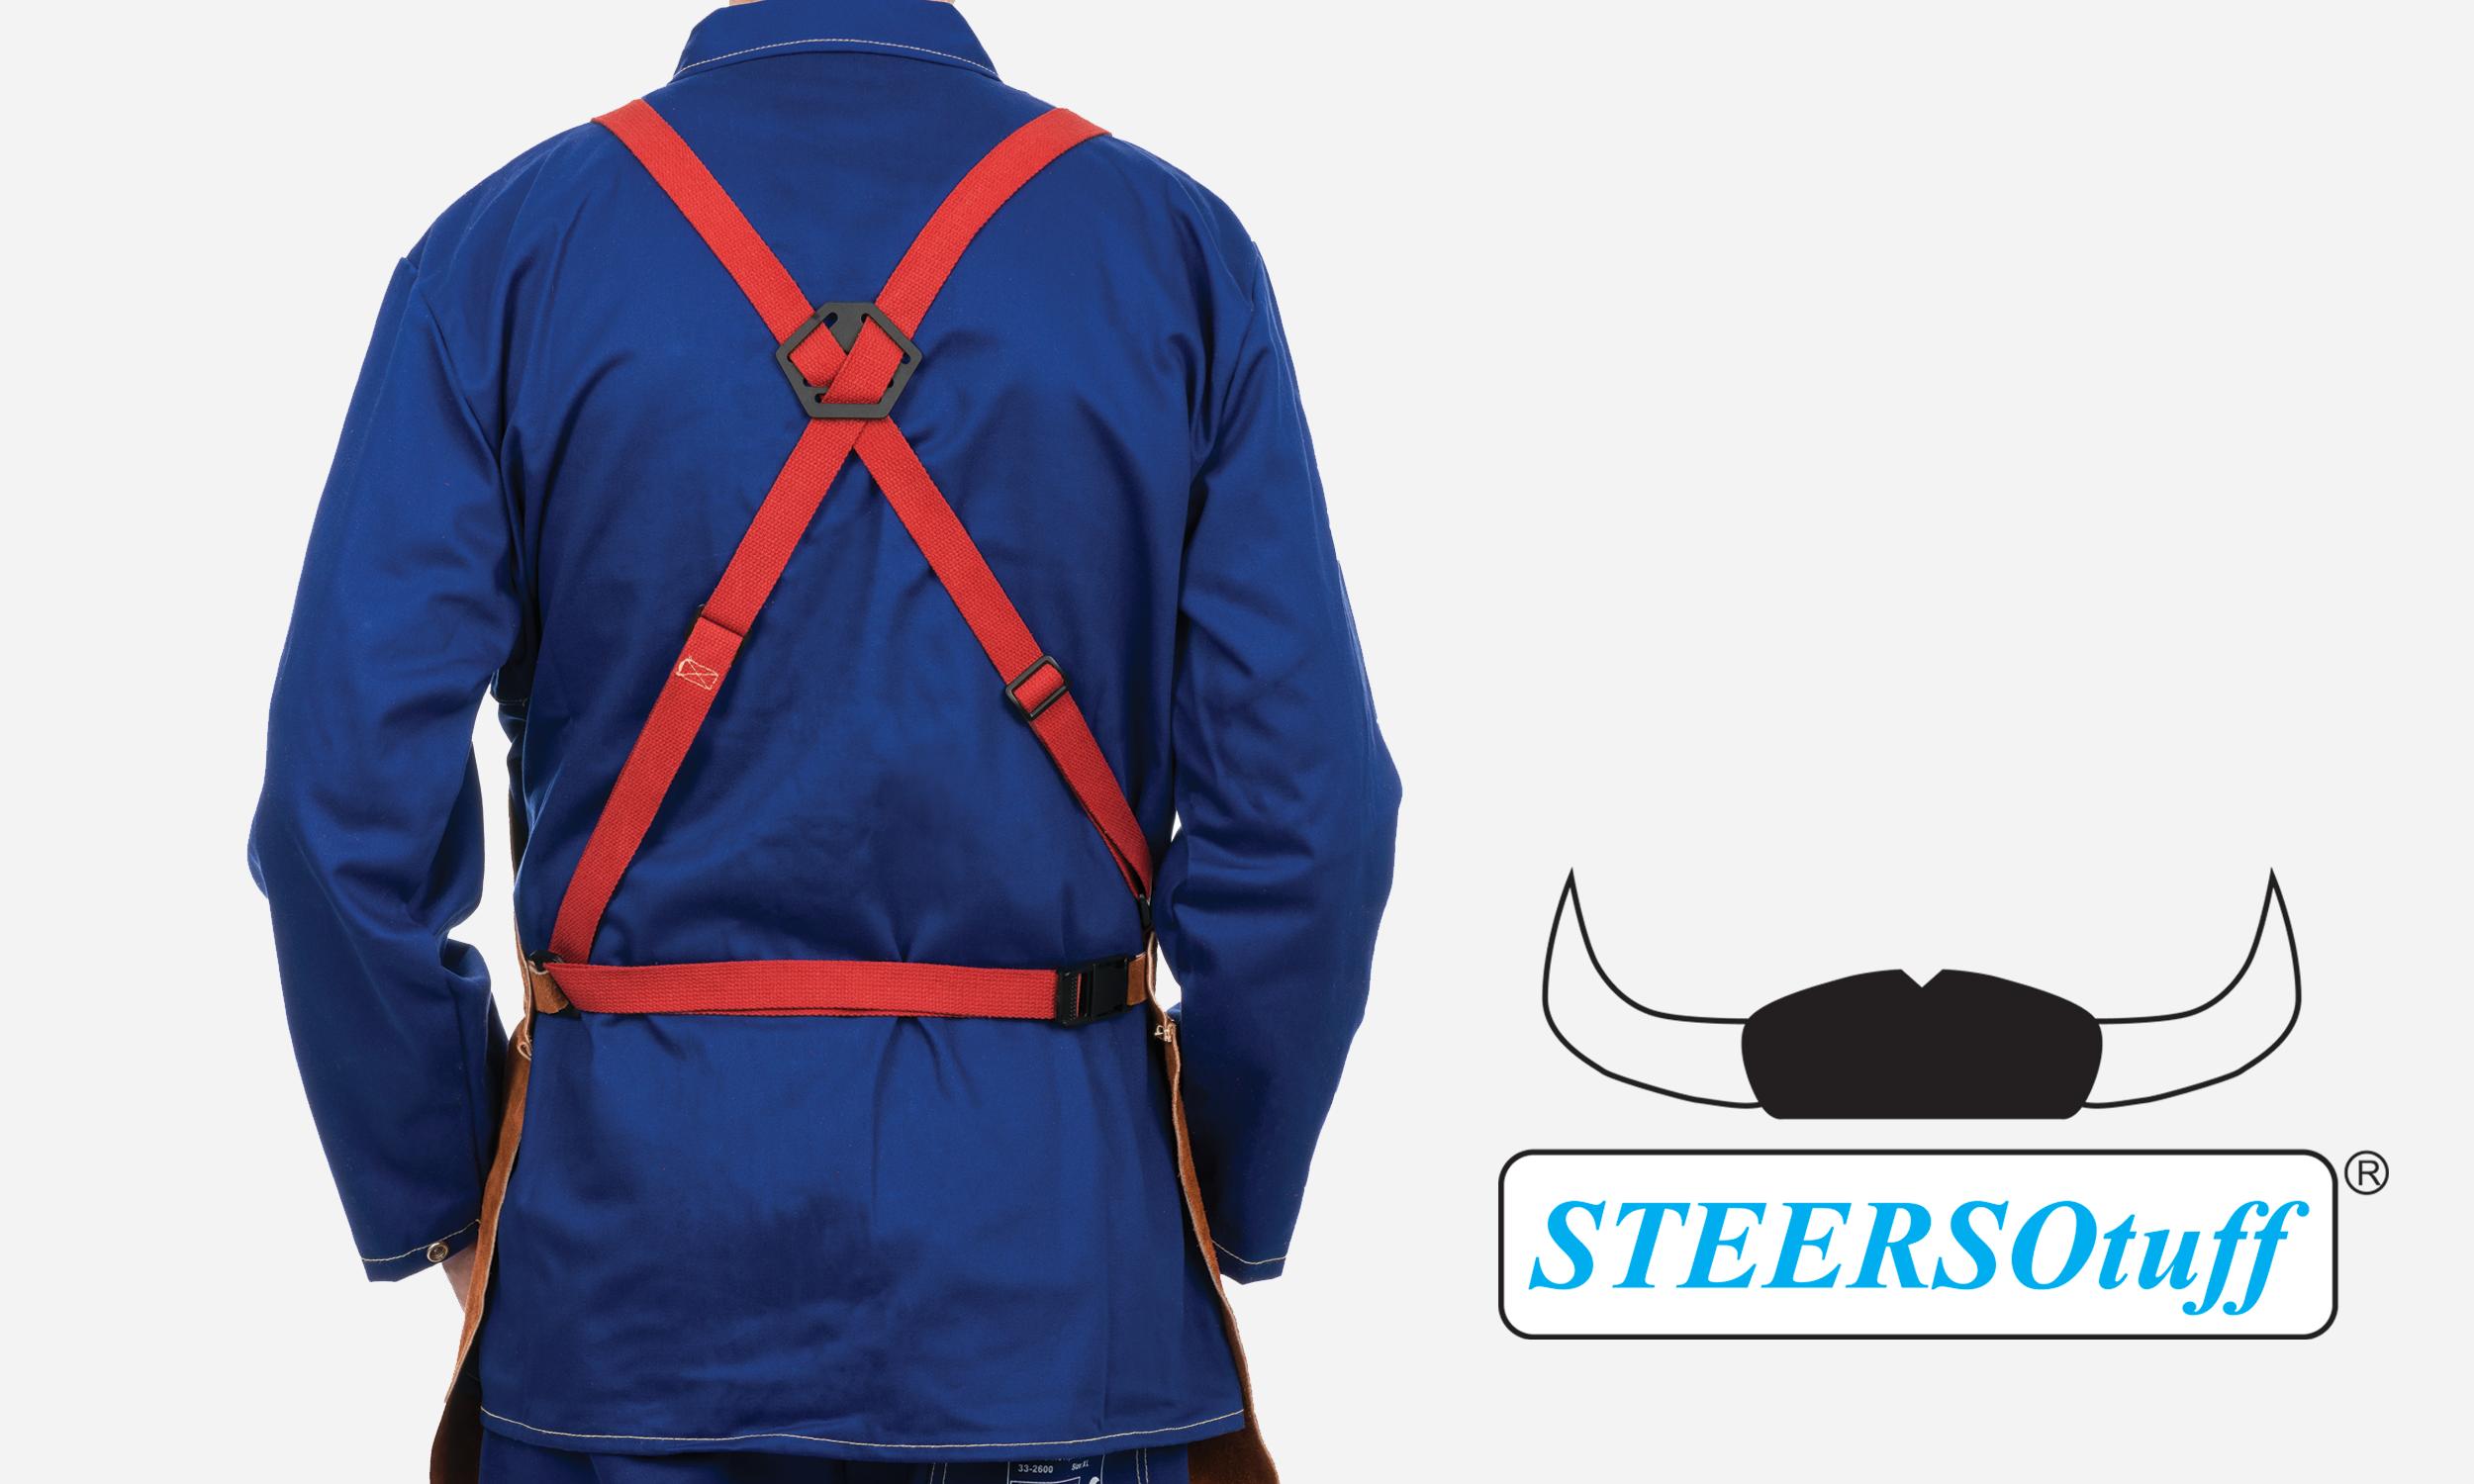 44-7136, 44-7142, 44-7148 Premium Leather Bib Apron Back Side View.png